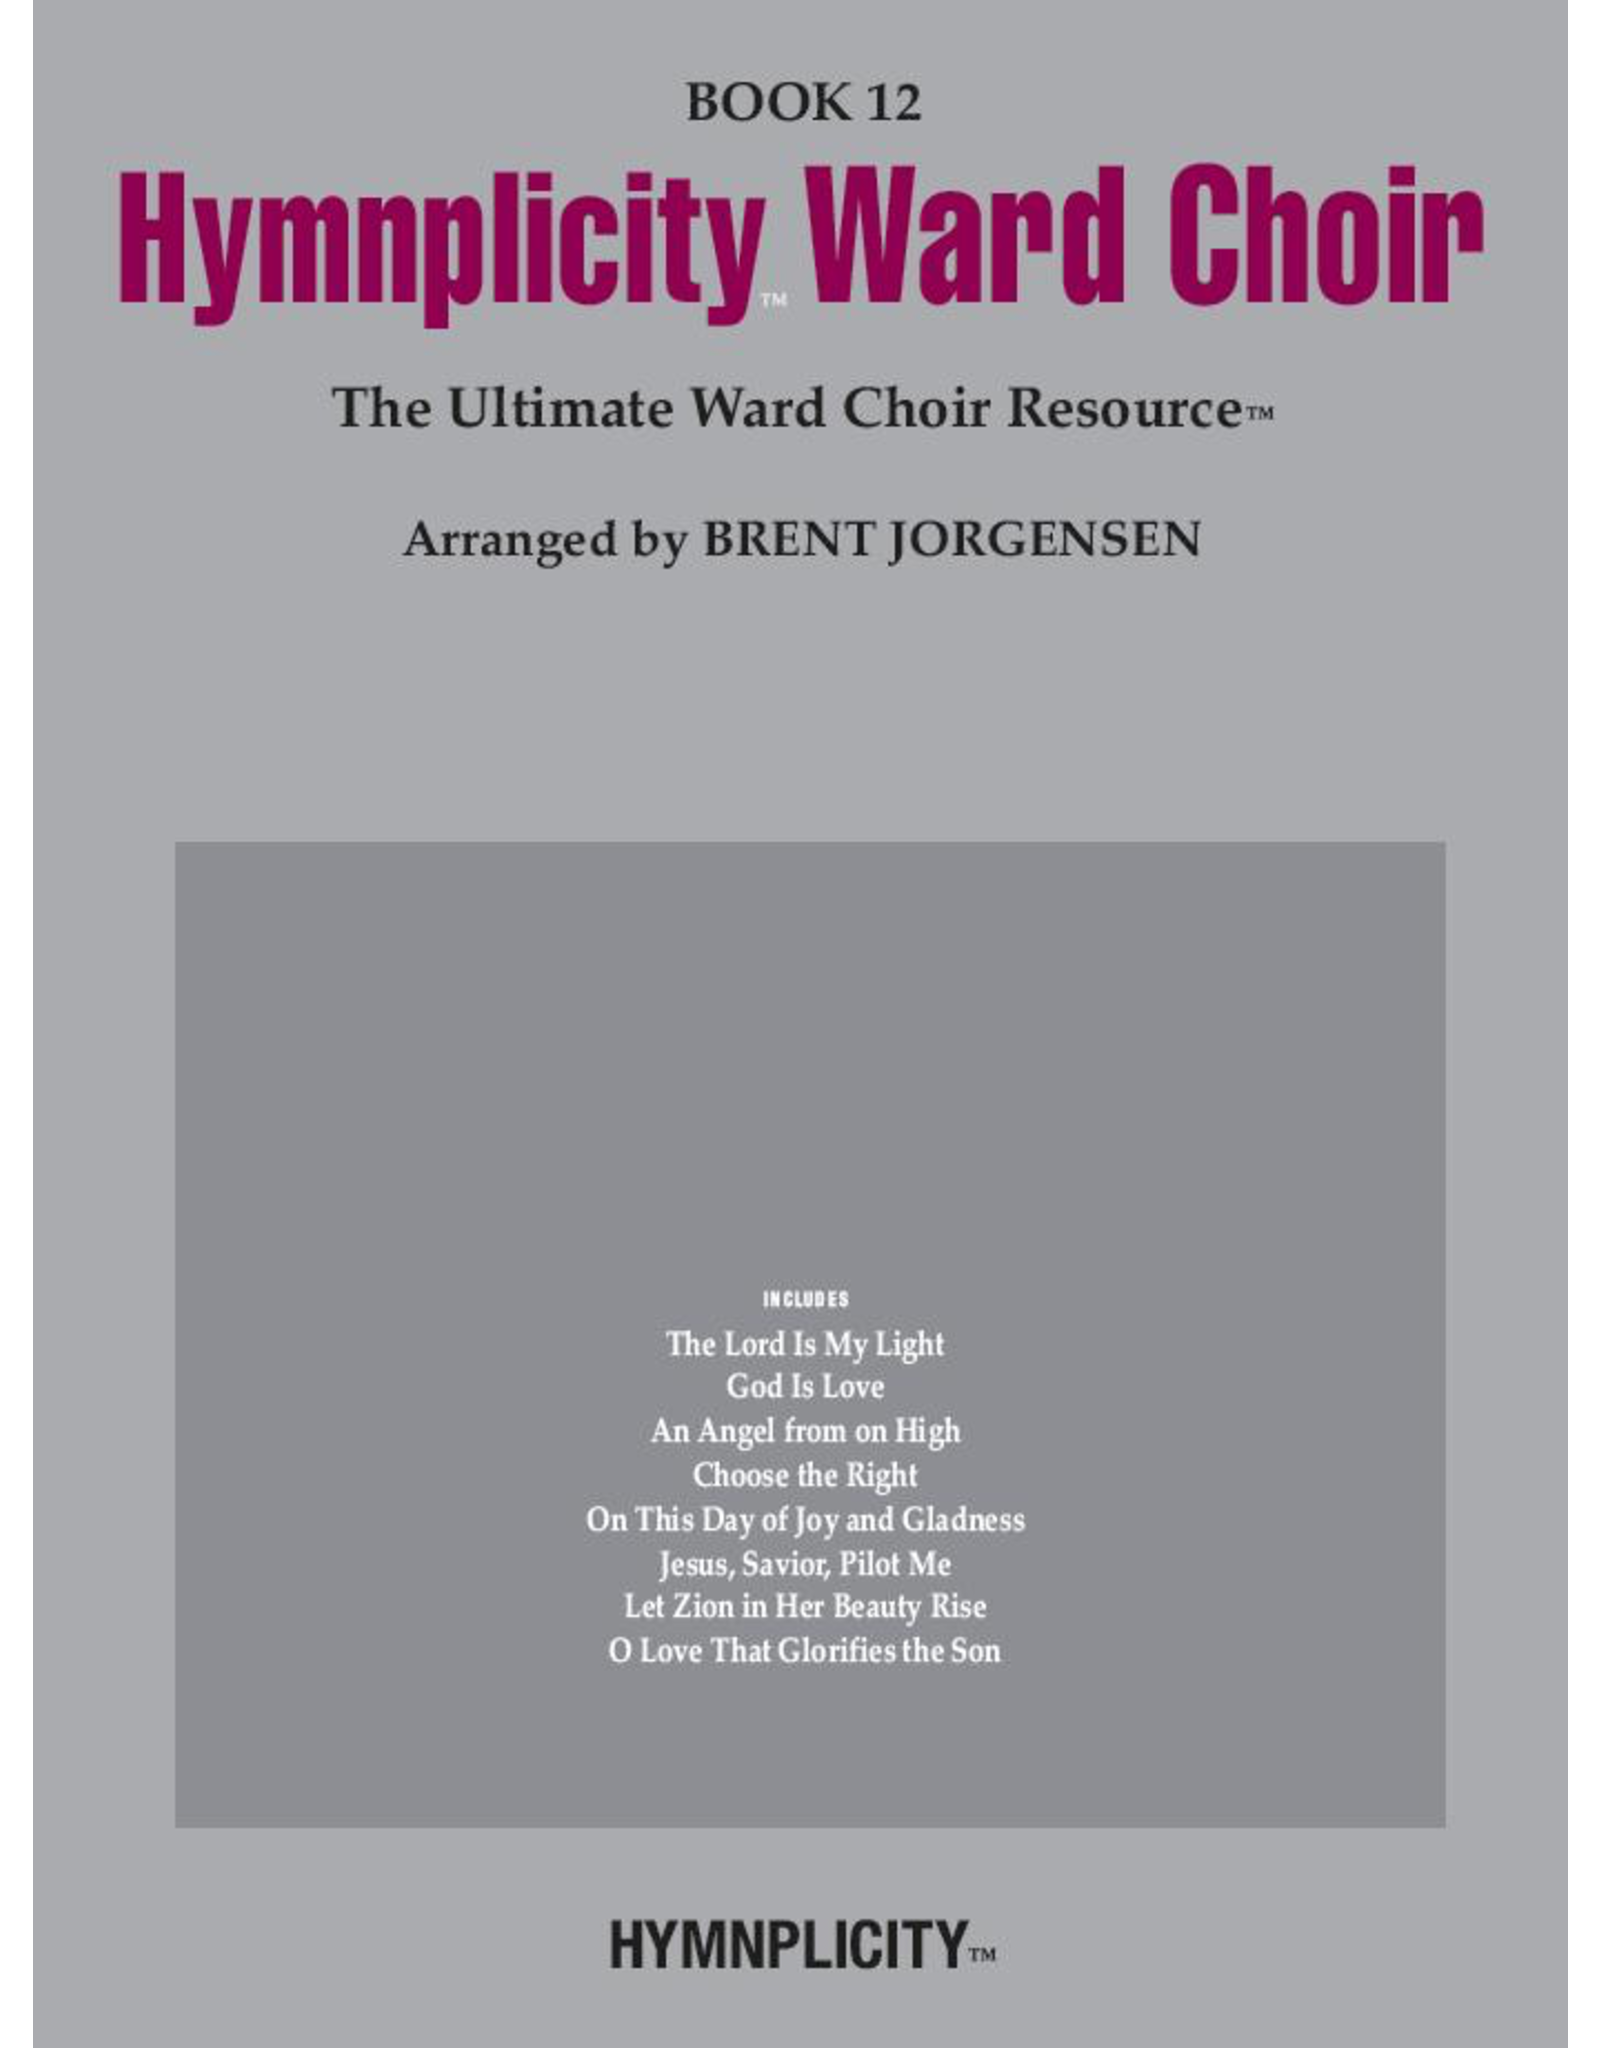 Jackman Music Hymnplicity Ward Choir, Book 12